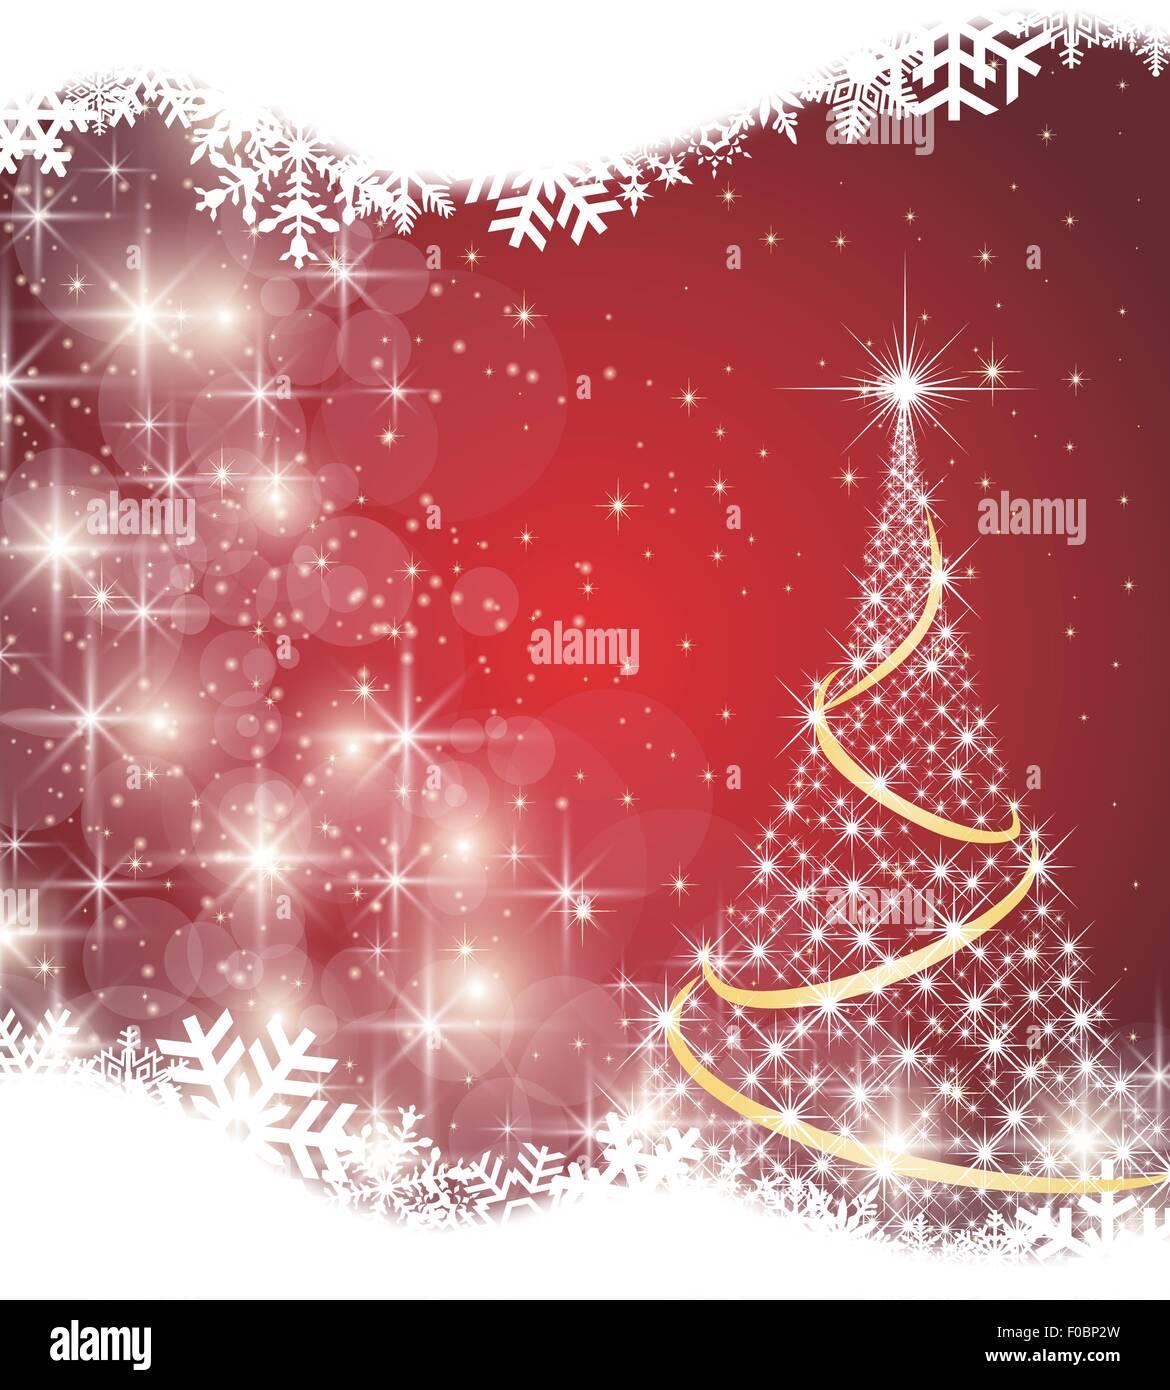 Noël arrière-plan Photo Stock